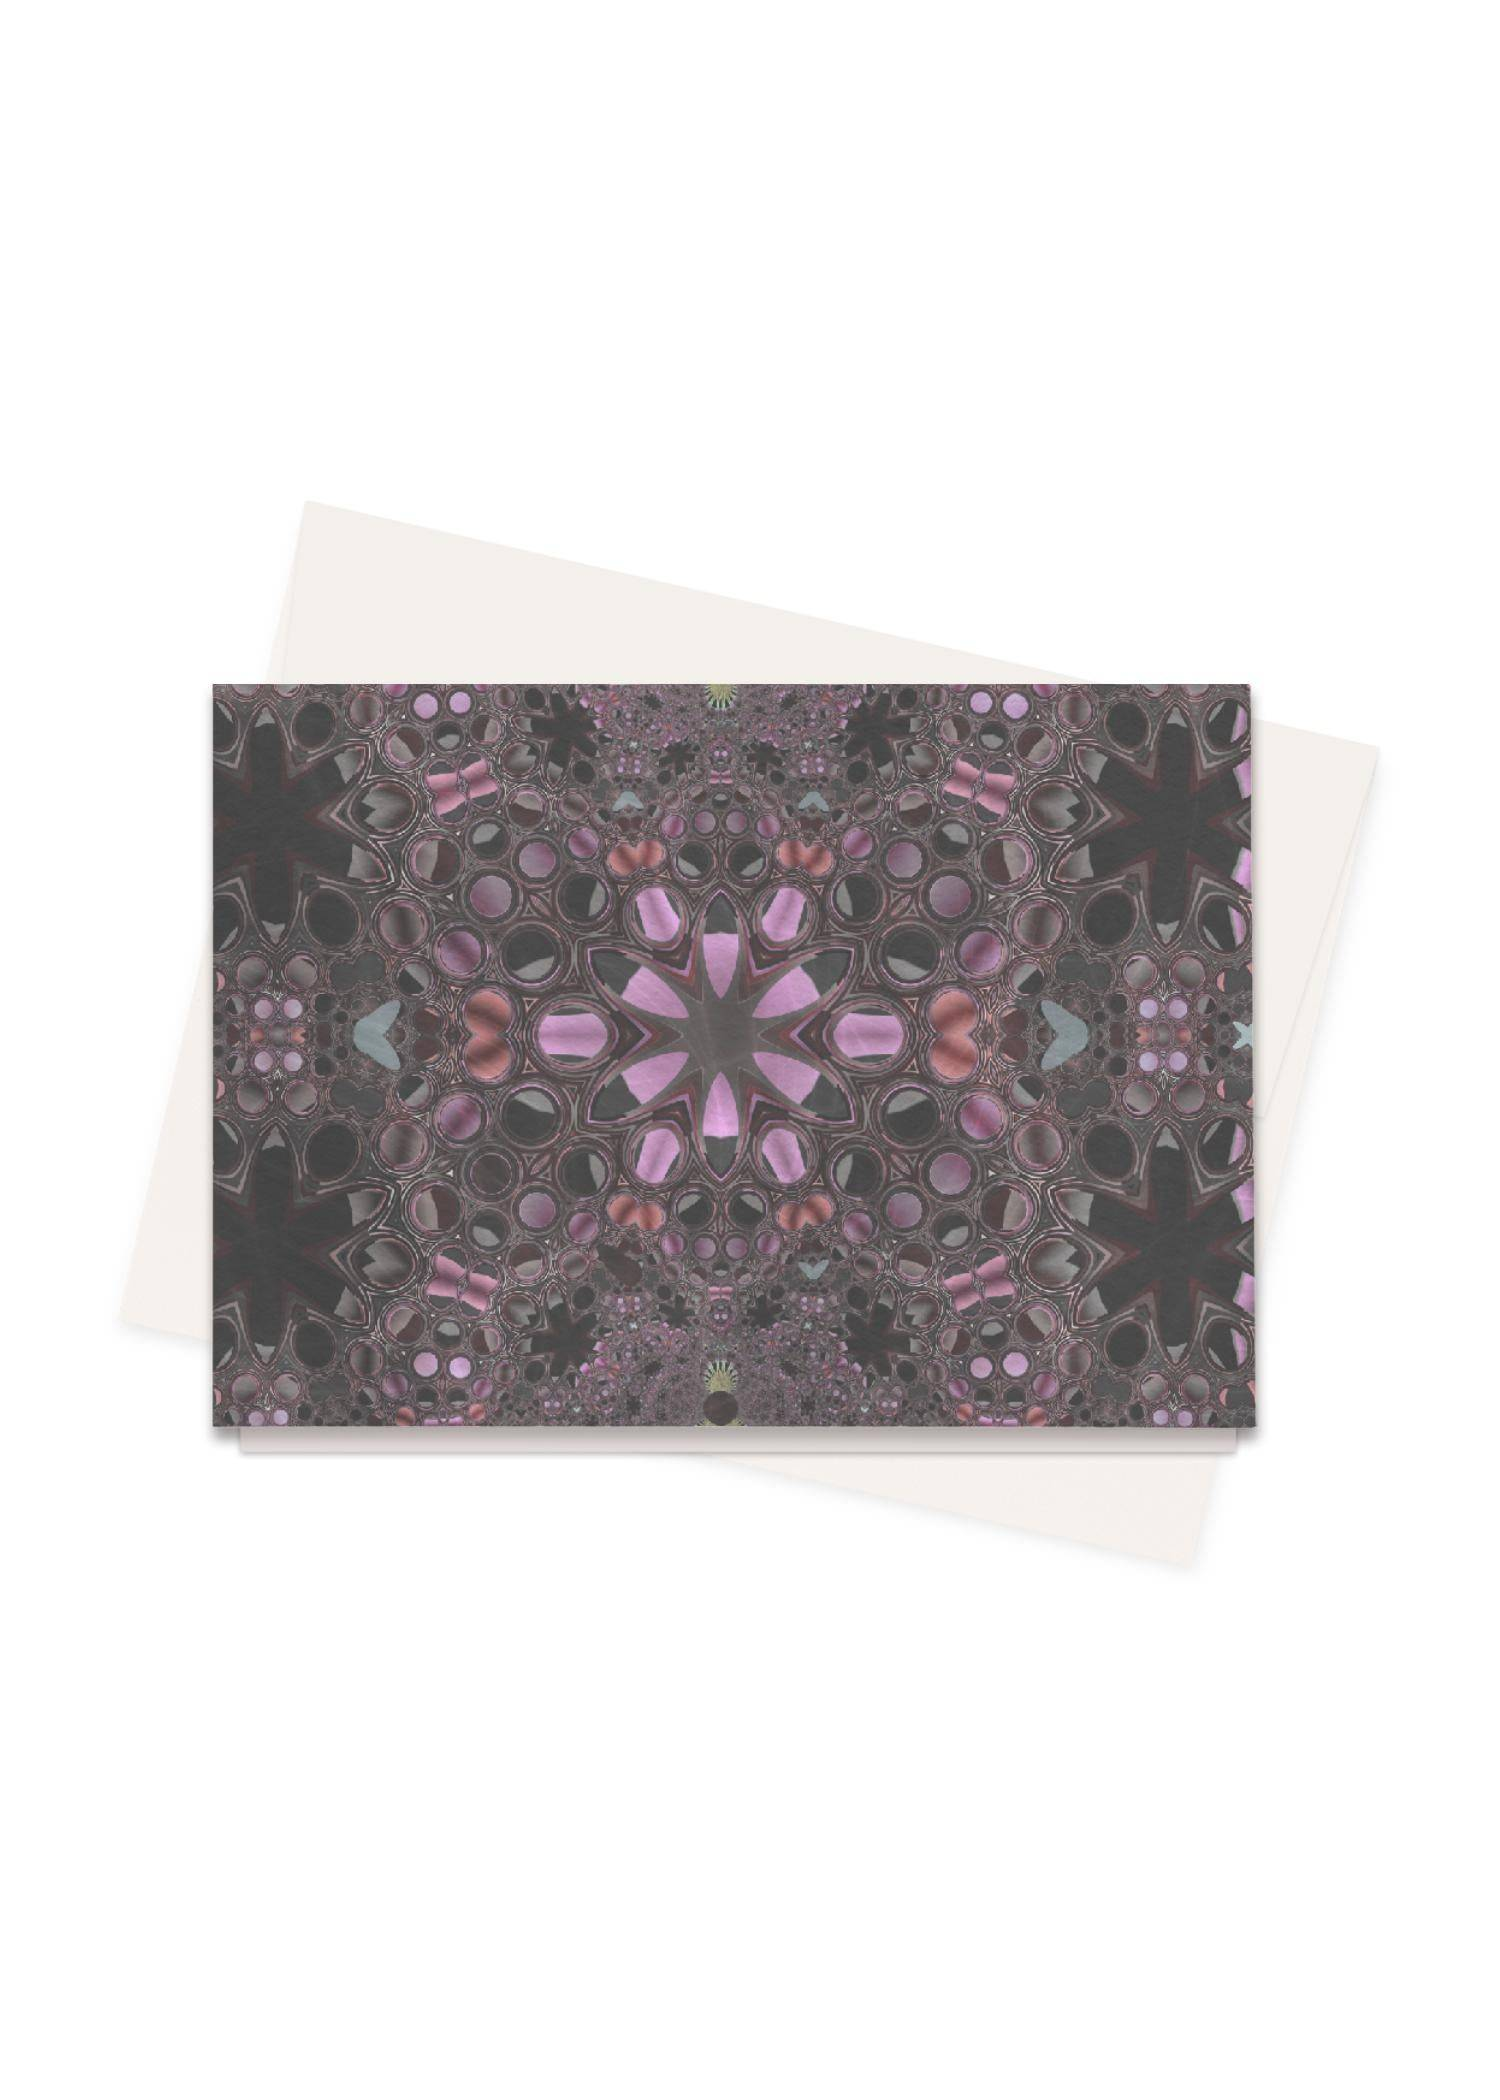 PRIDE Greeting Cards Set - Purpose #Pillows by PRIDE Original Artist  - Size: Set of 16